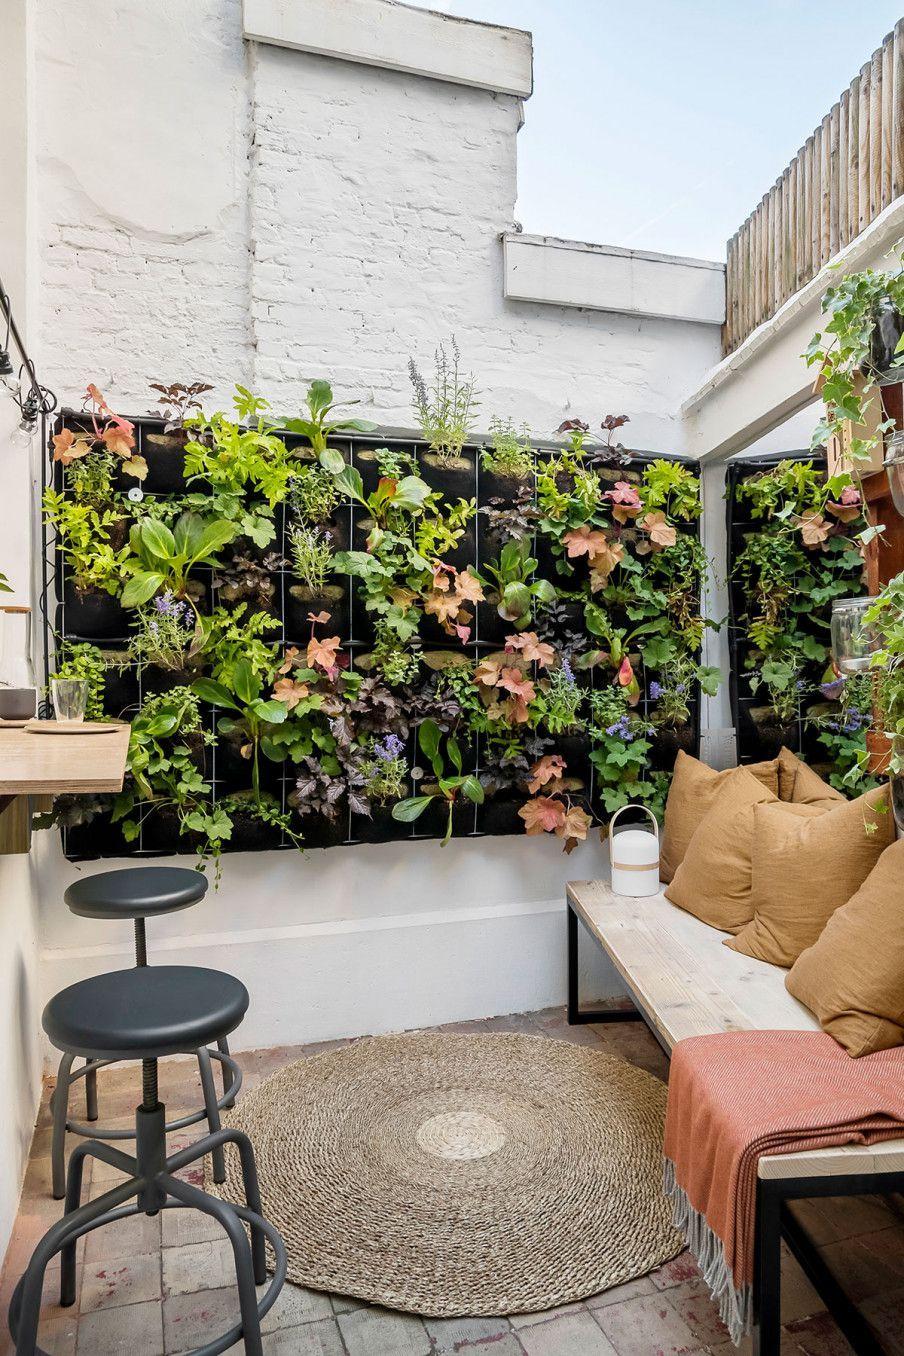 Groovy 33 Best Outdoor Creative Diy Hanging Planter Ideas Download Free Architecture Designs Scobabritishbridgeorg